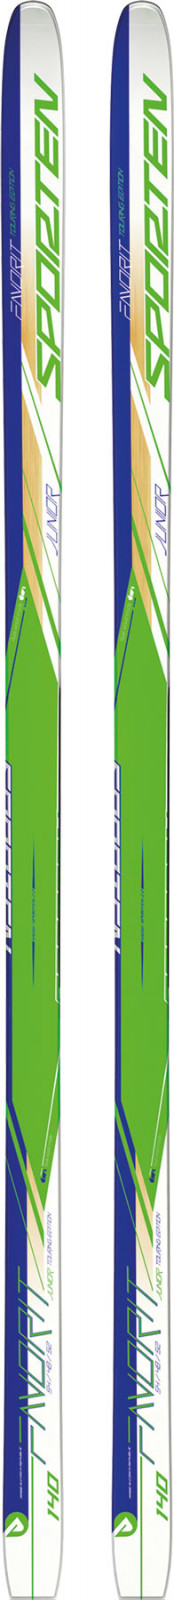 Sporten Favorit Jr. Boy 140 - 170 cm - řezaný protismyk